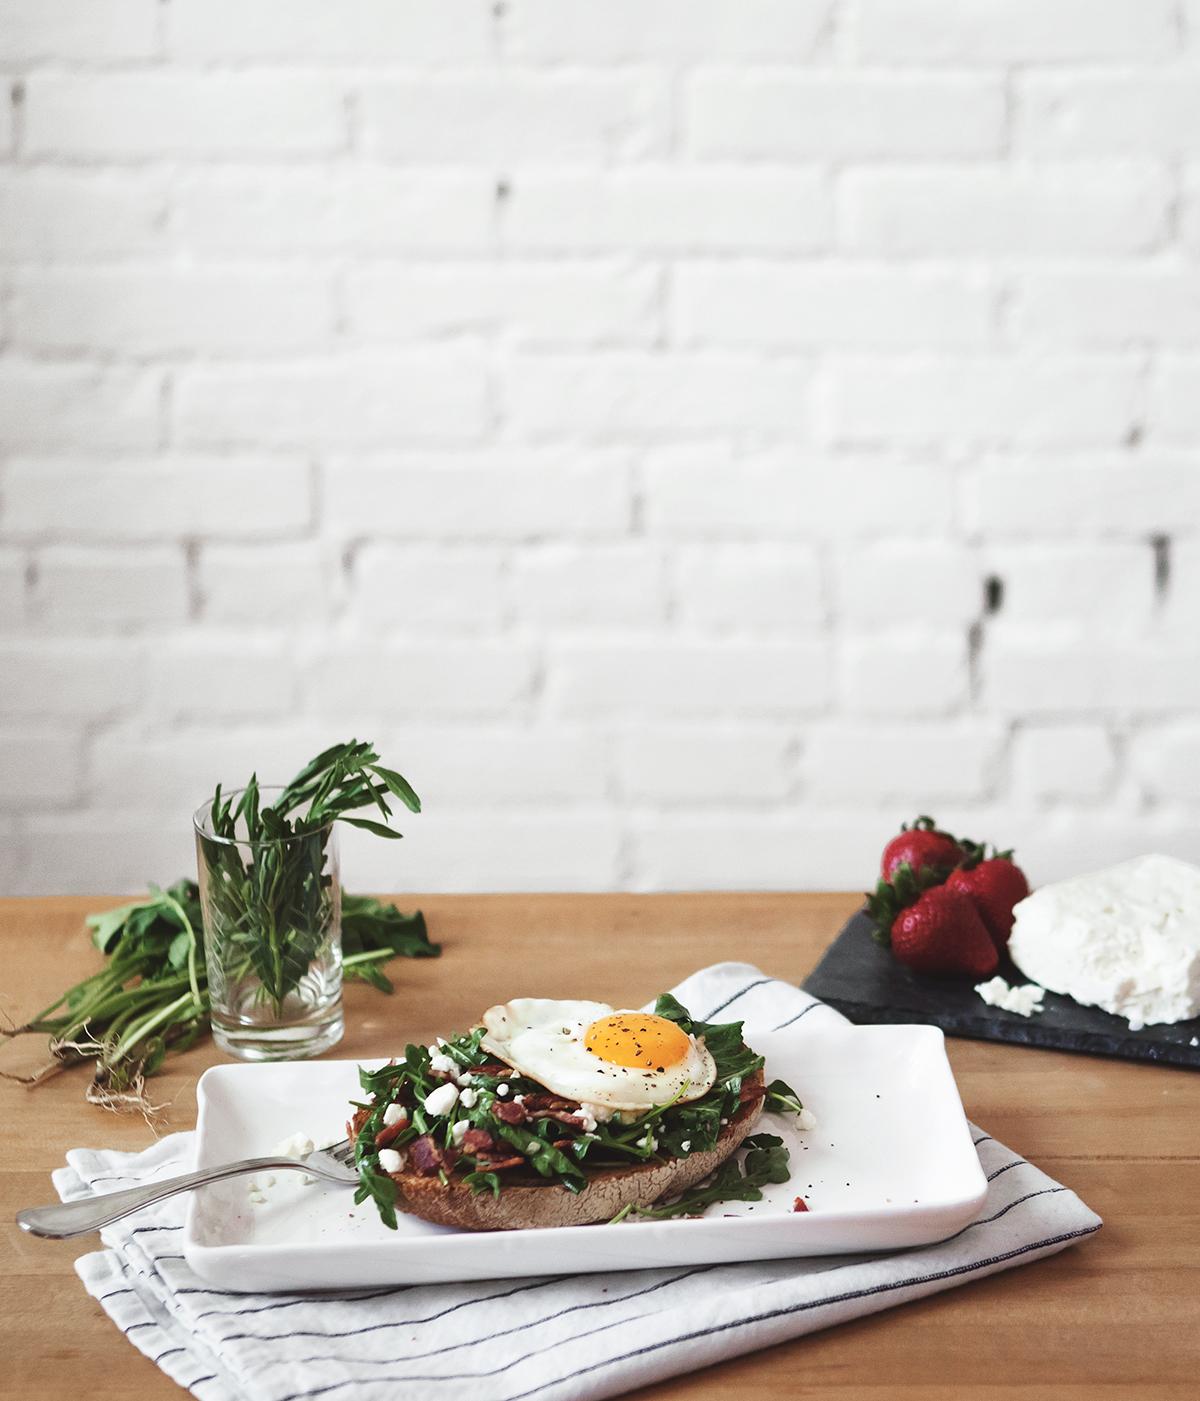 arugula-tartine-with-bacon-feta-and-taragon-vinaigrette.jpg